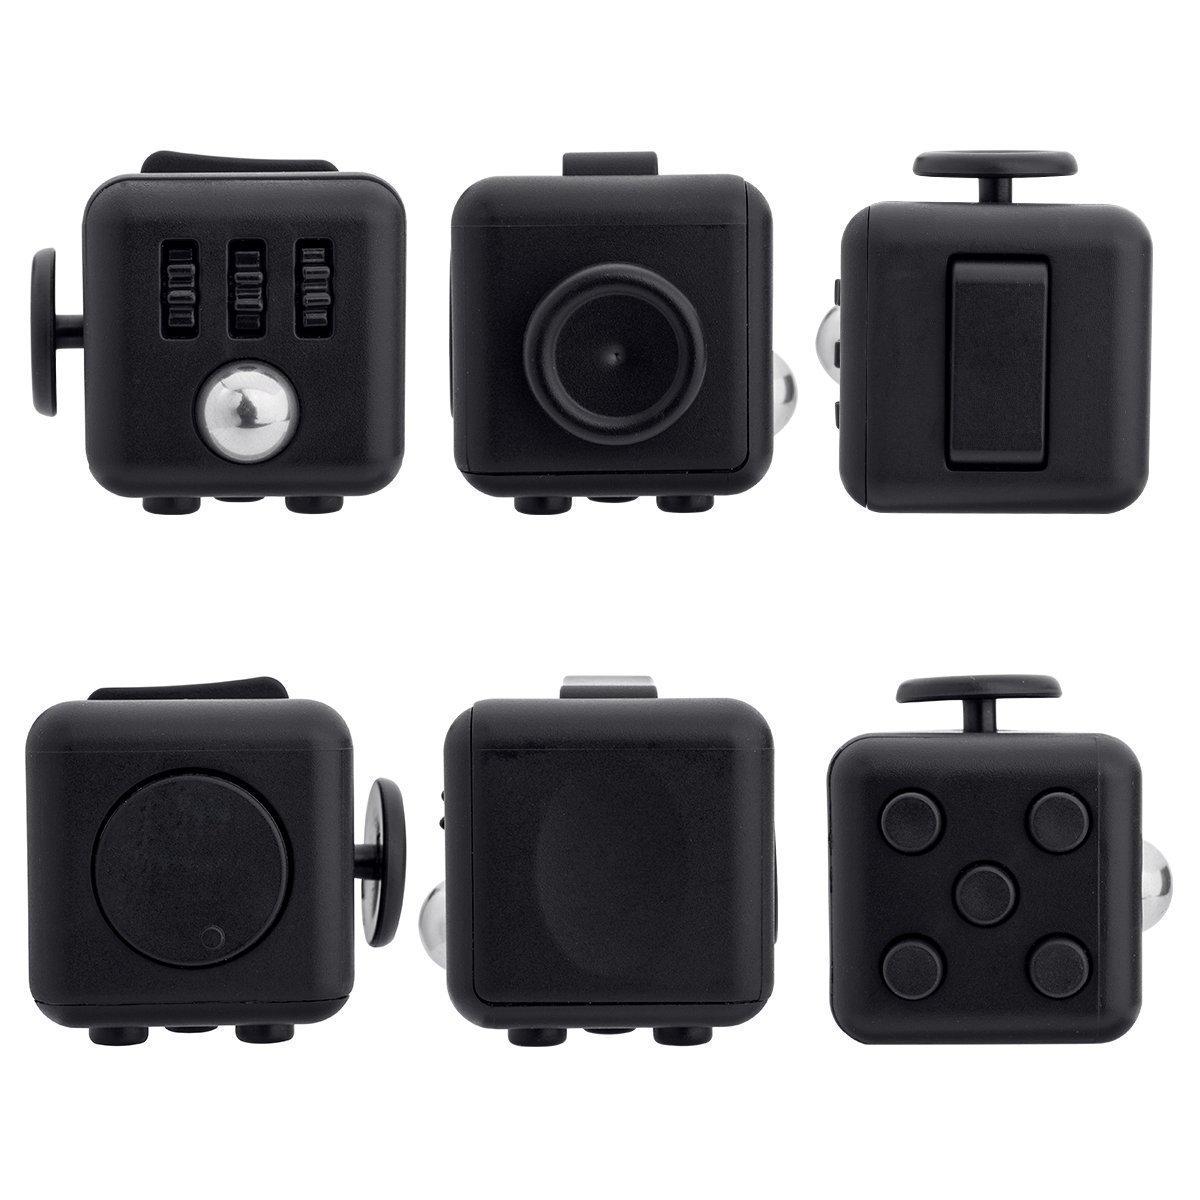 Black Fidget Cube